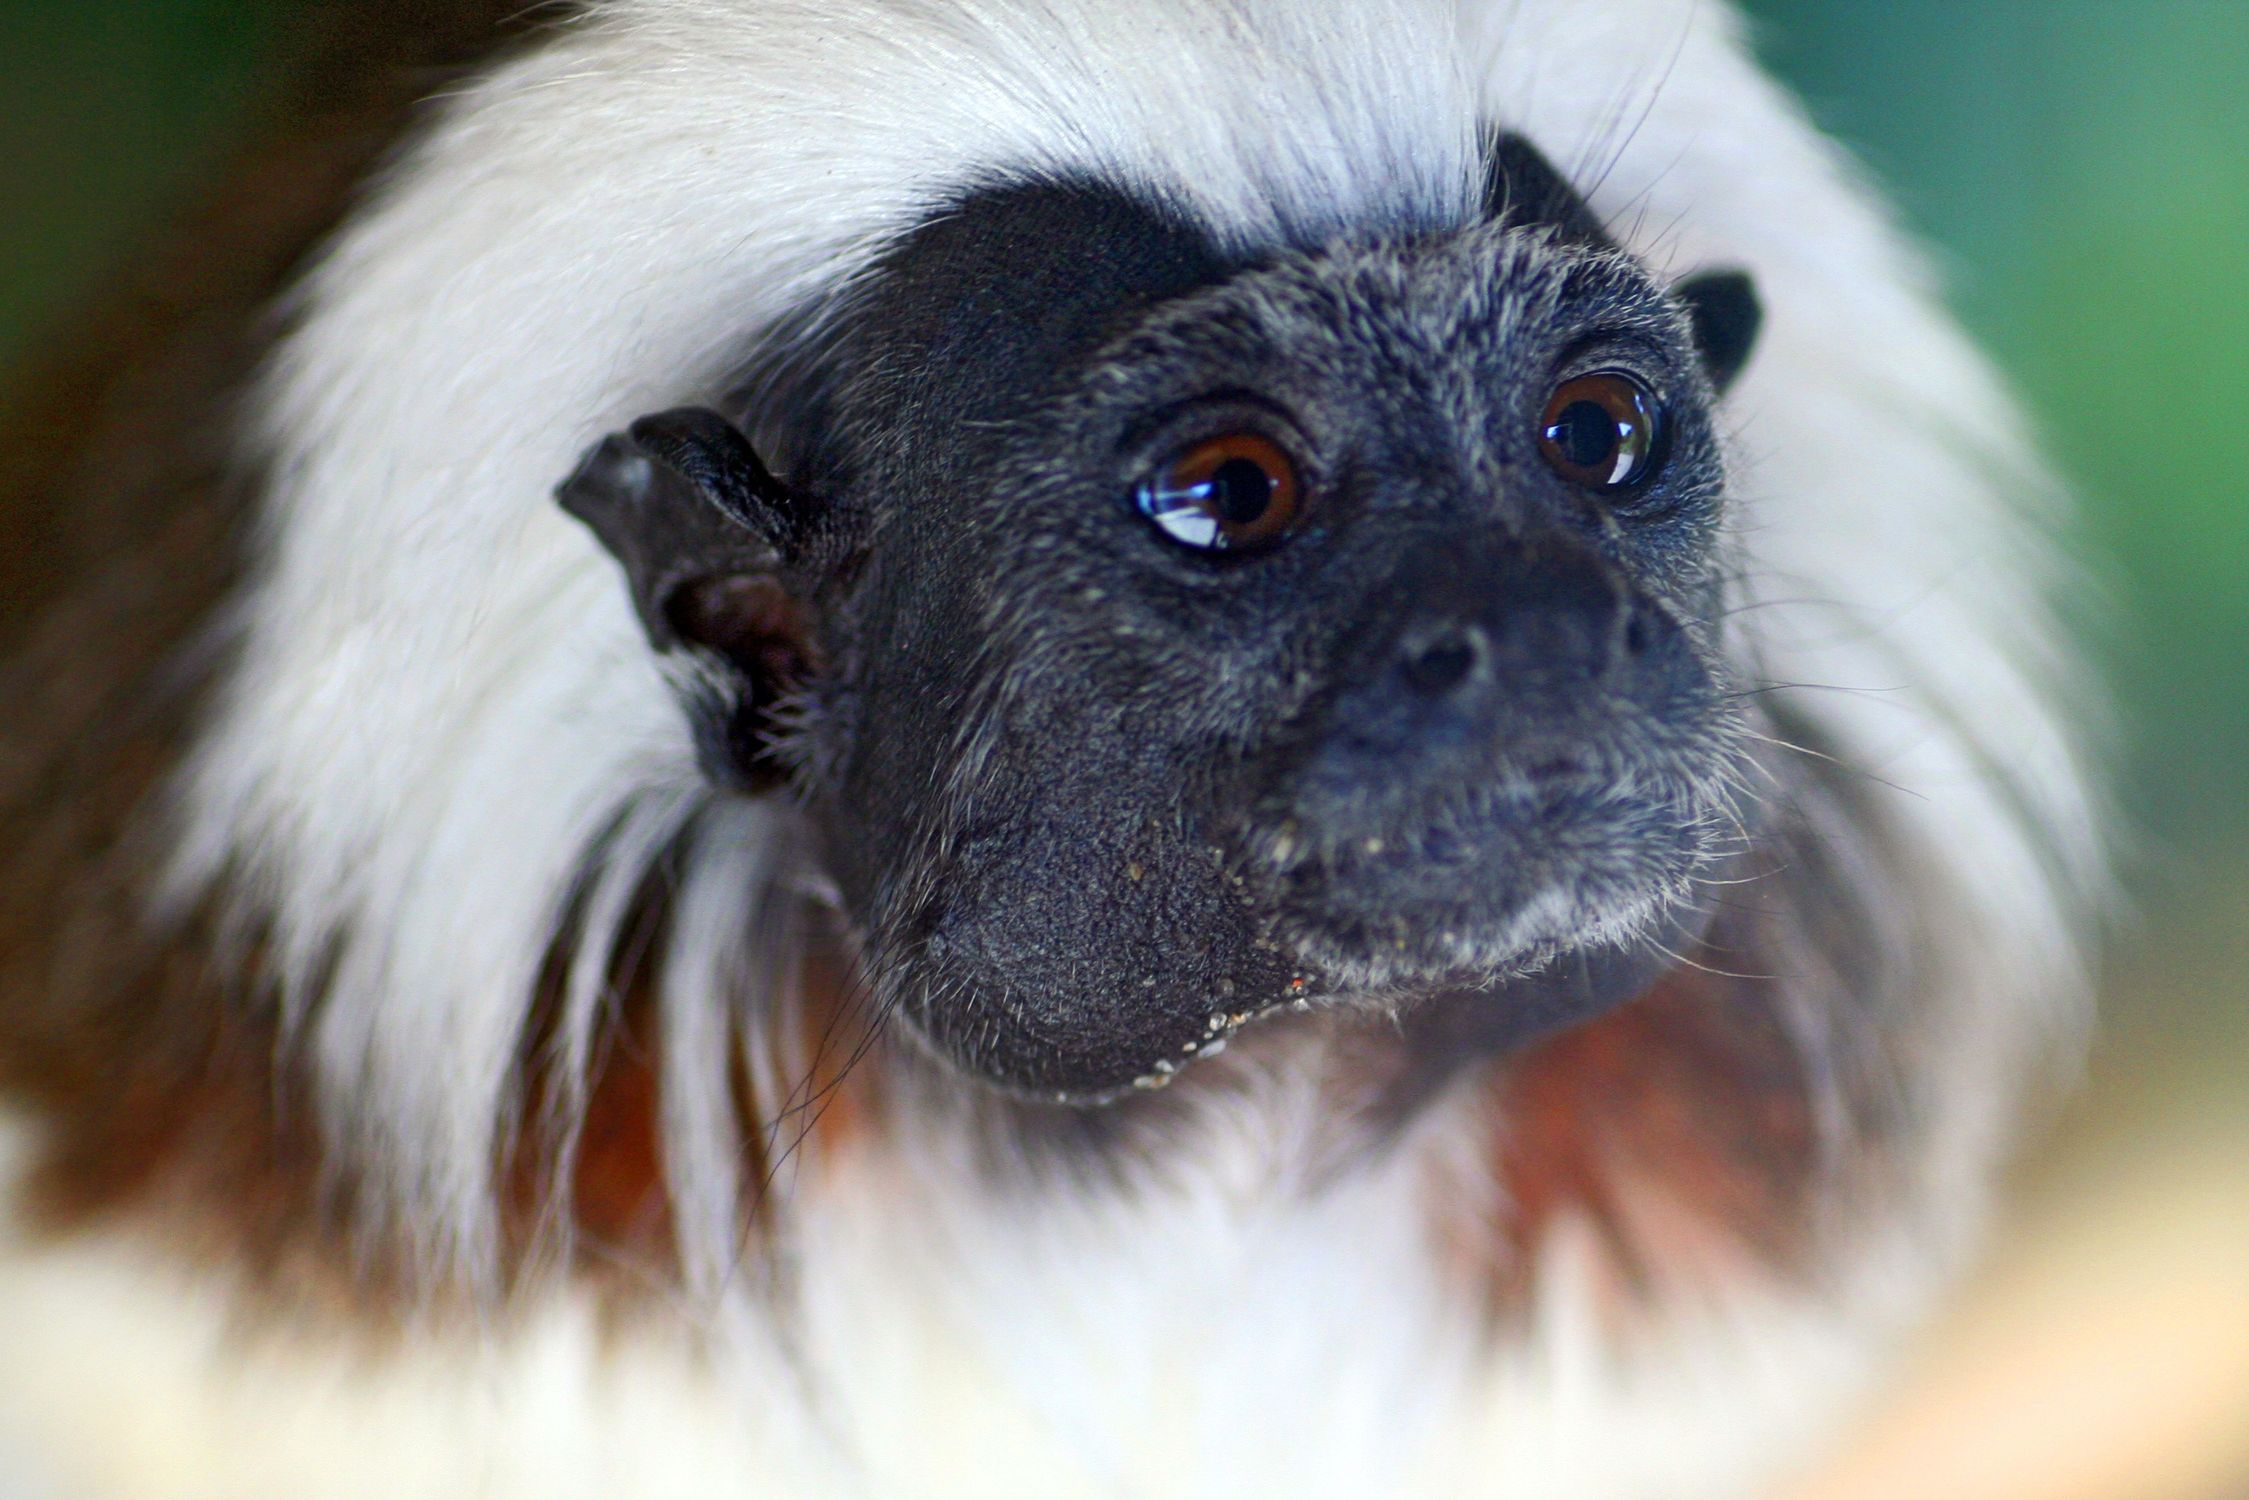 Bild mit Tiere, Säugetiere, Primaten, Menschen, Natur, Menschenaffen, Schimpansen, Makaken, Affe, Tier, Bonobo, Zwergschimpanse, Hominidae, Pan troglodytes, Pan paniscus, Affen